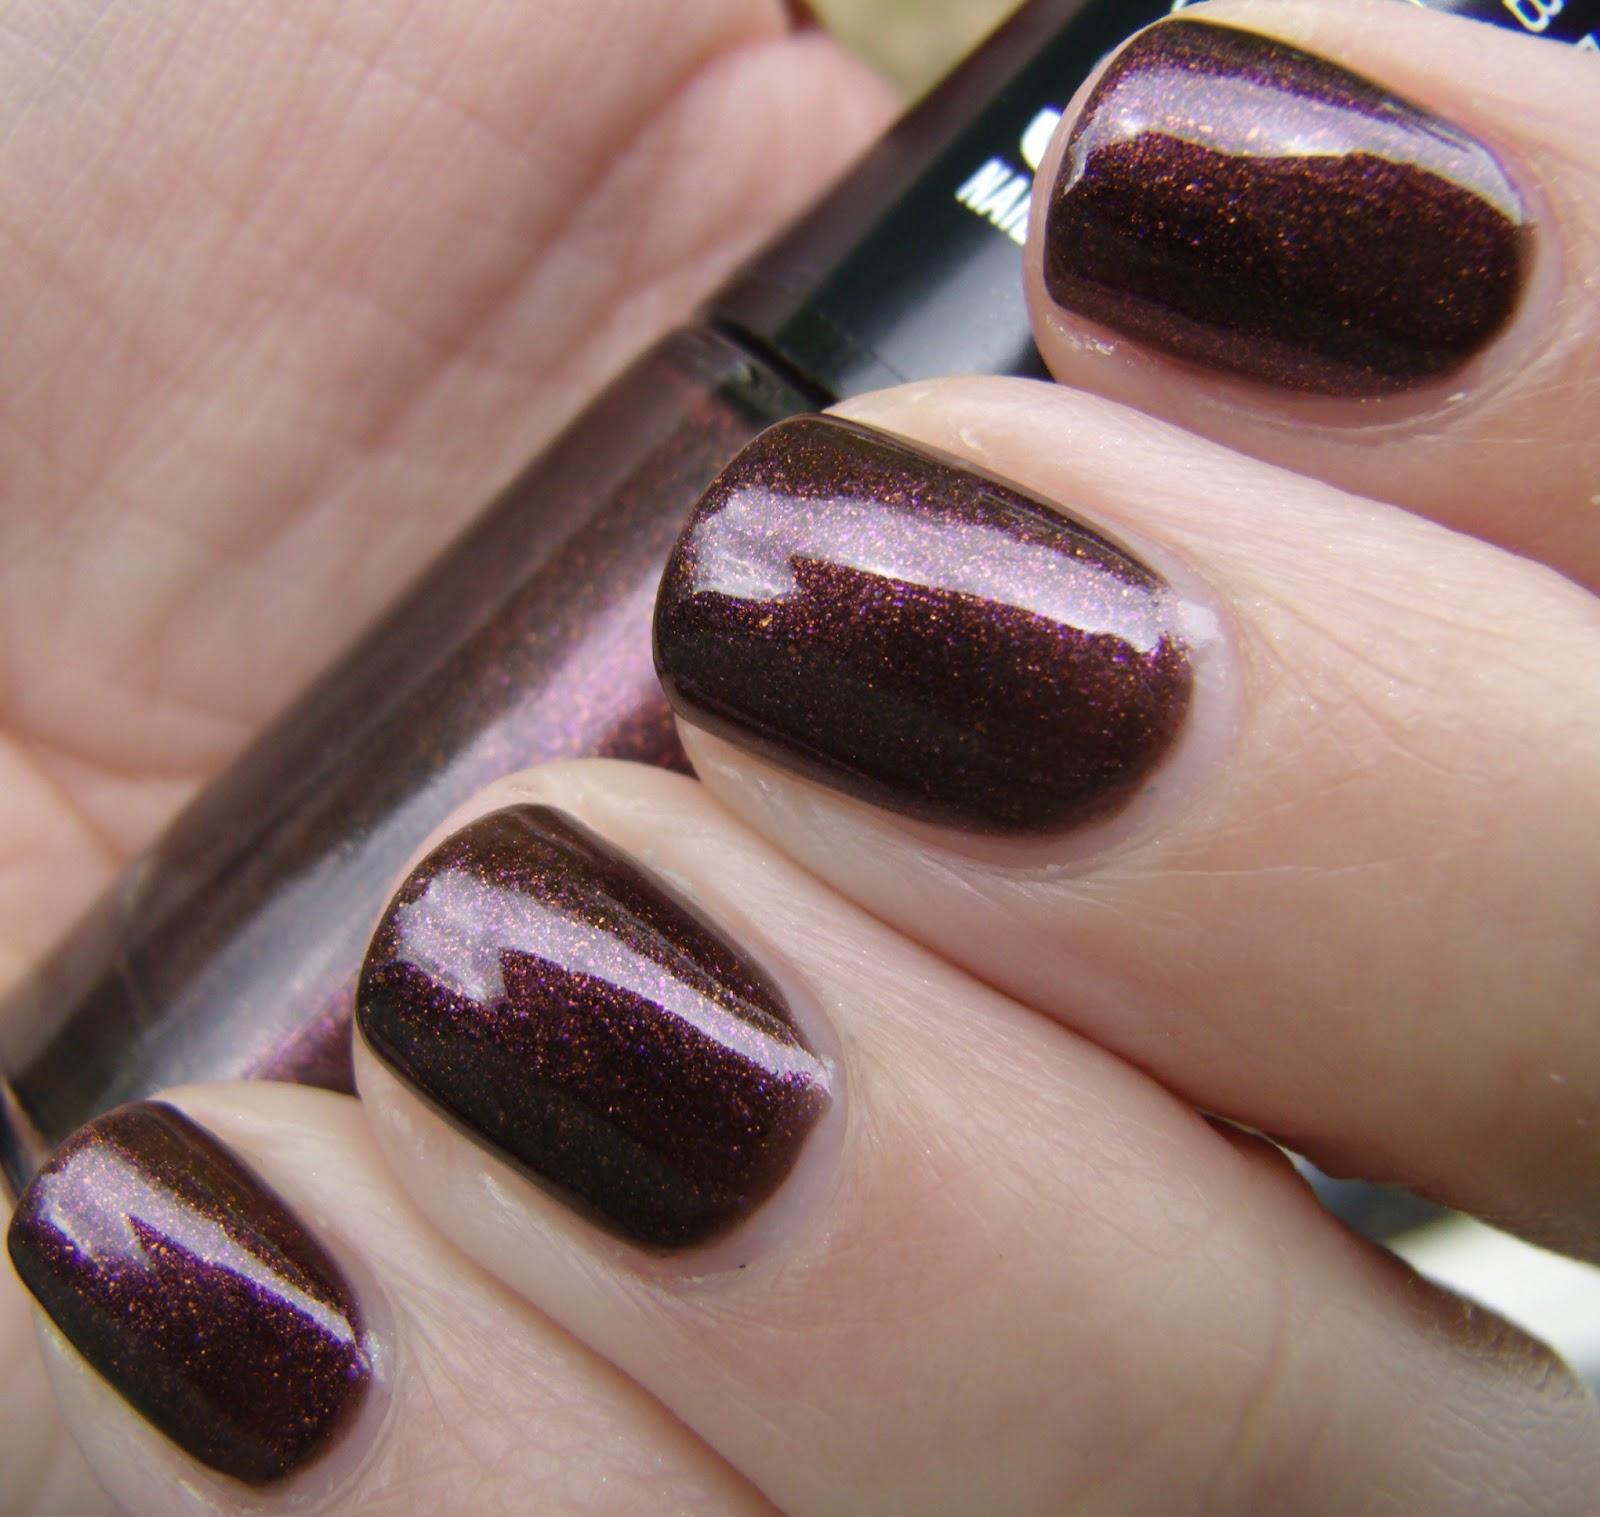 Wine Colored Nail Polish: Obsessive Cosmetic Hoarders Unite!: New Maybelline Color